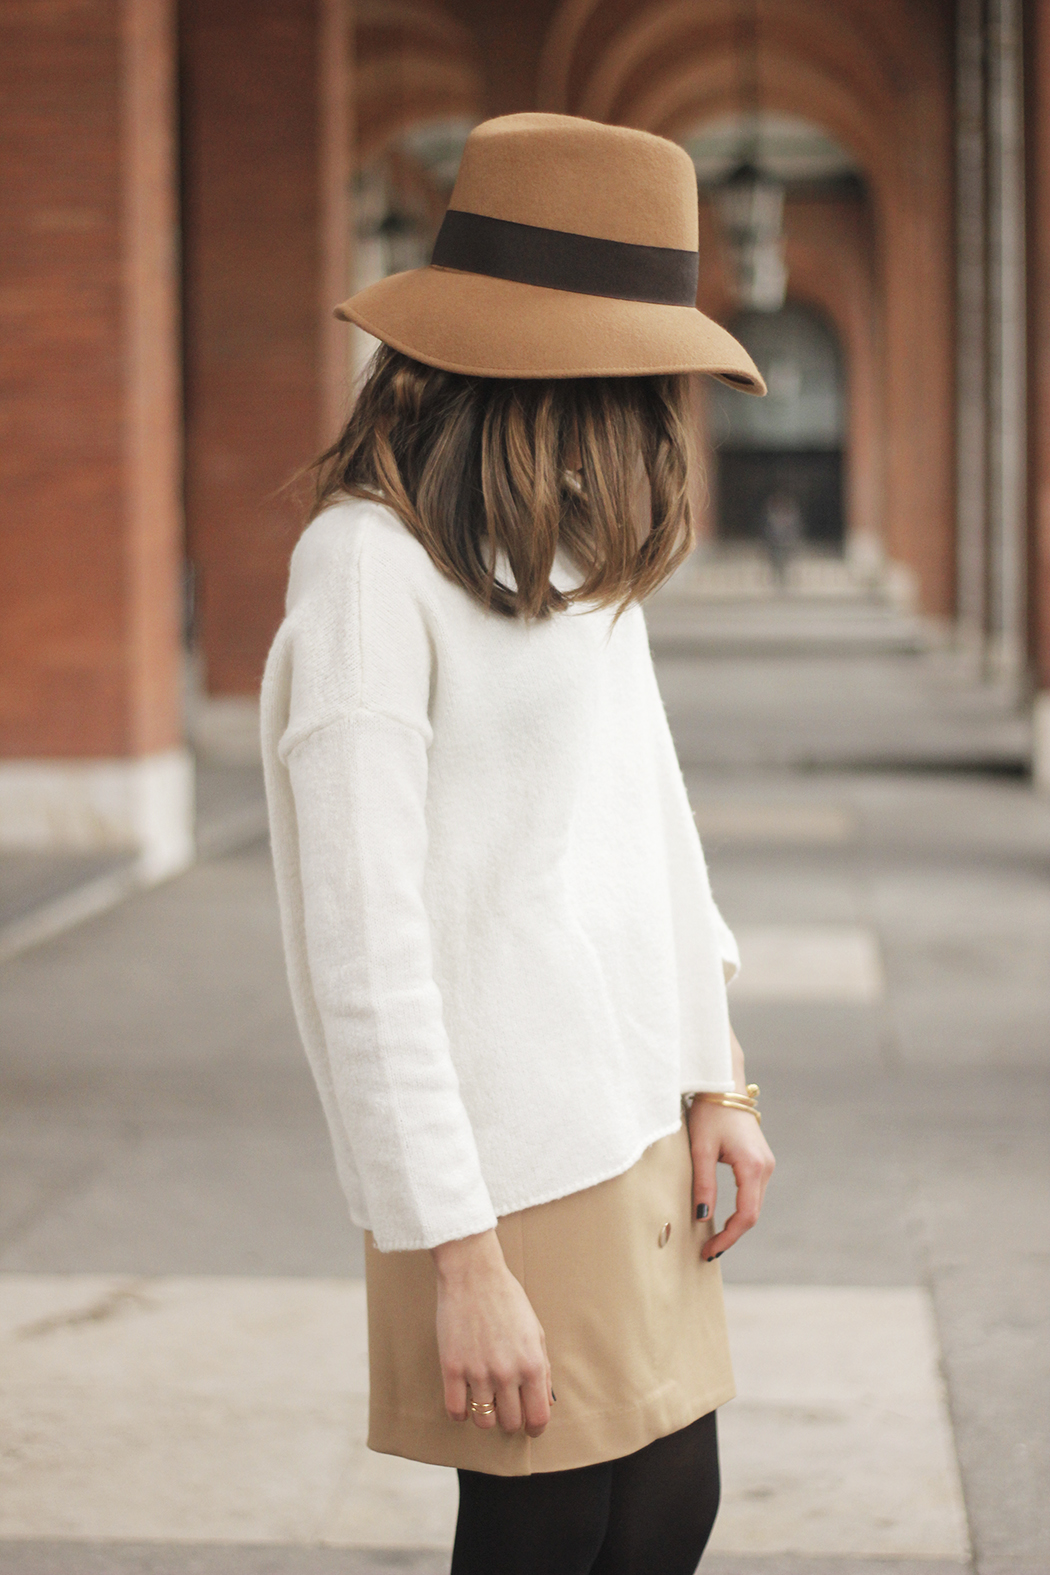 Camel Skirt Mango White Sweater Zara Camel Hat heels fashion outfit09